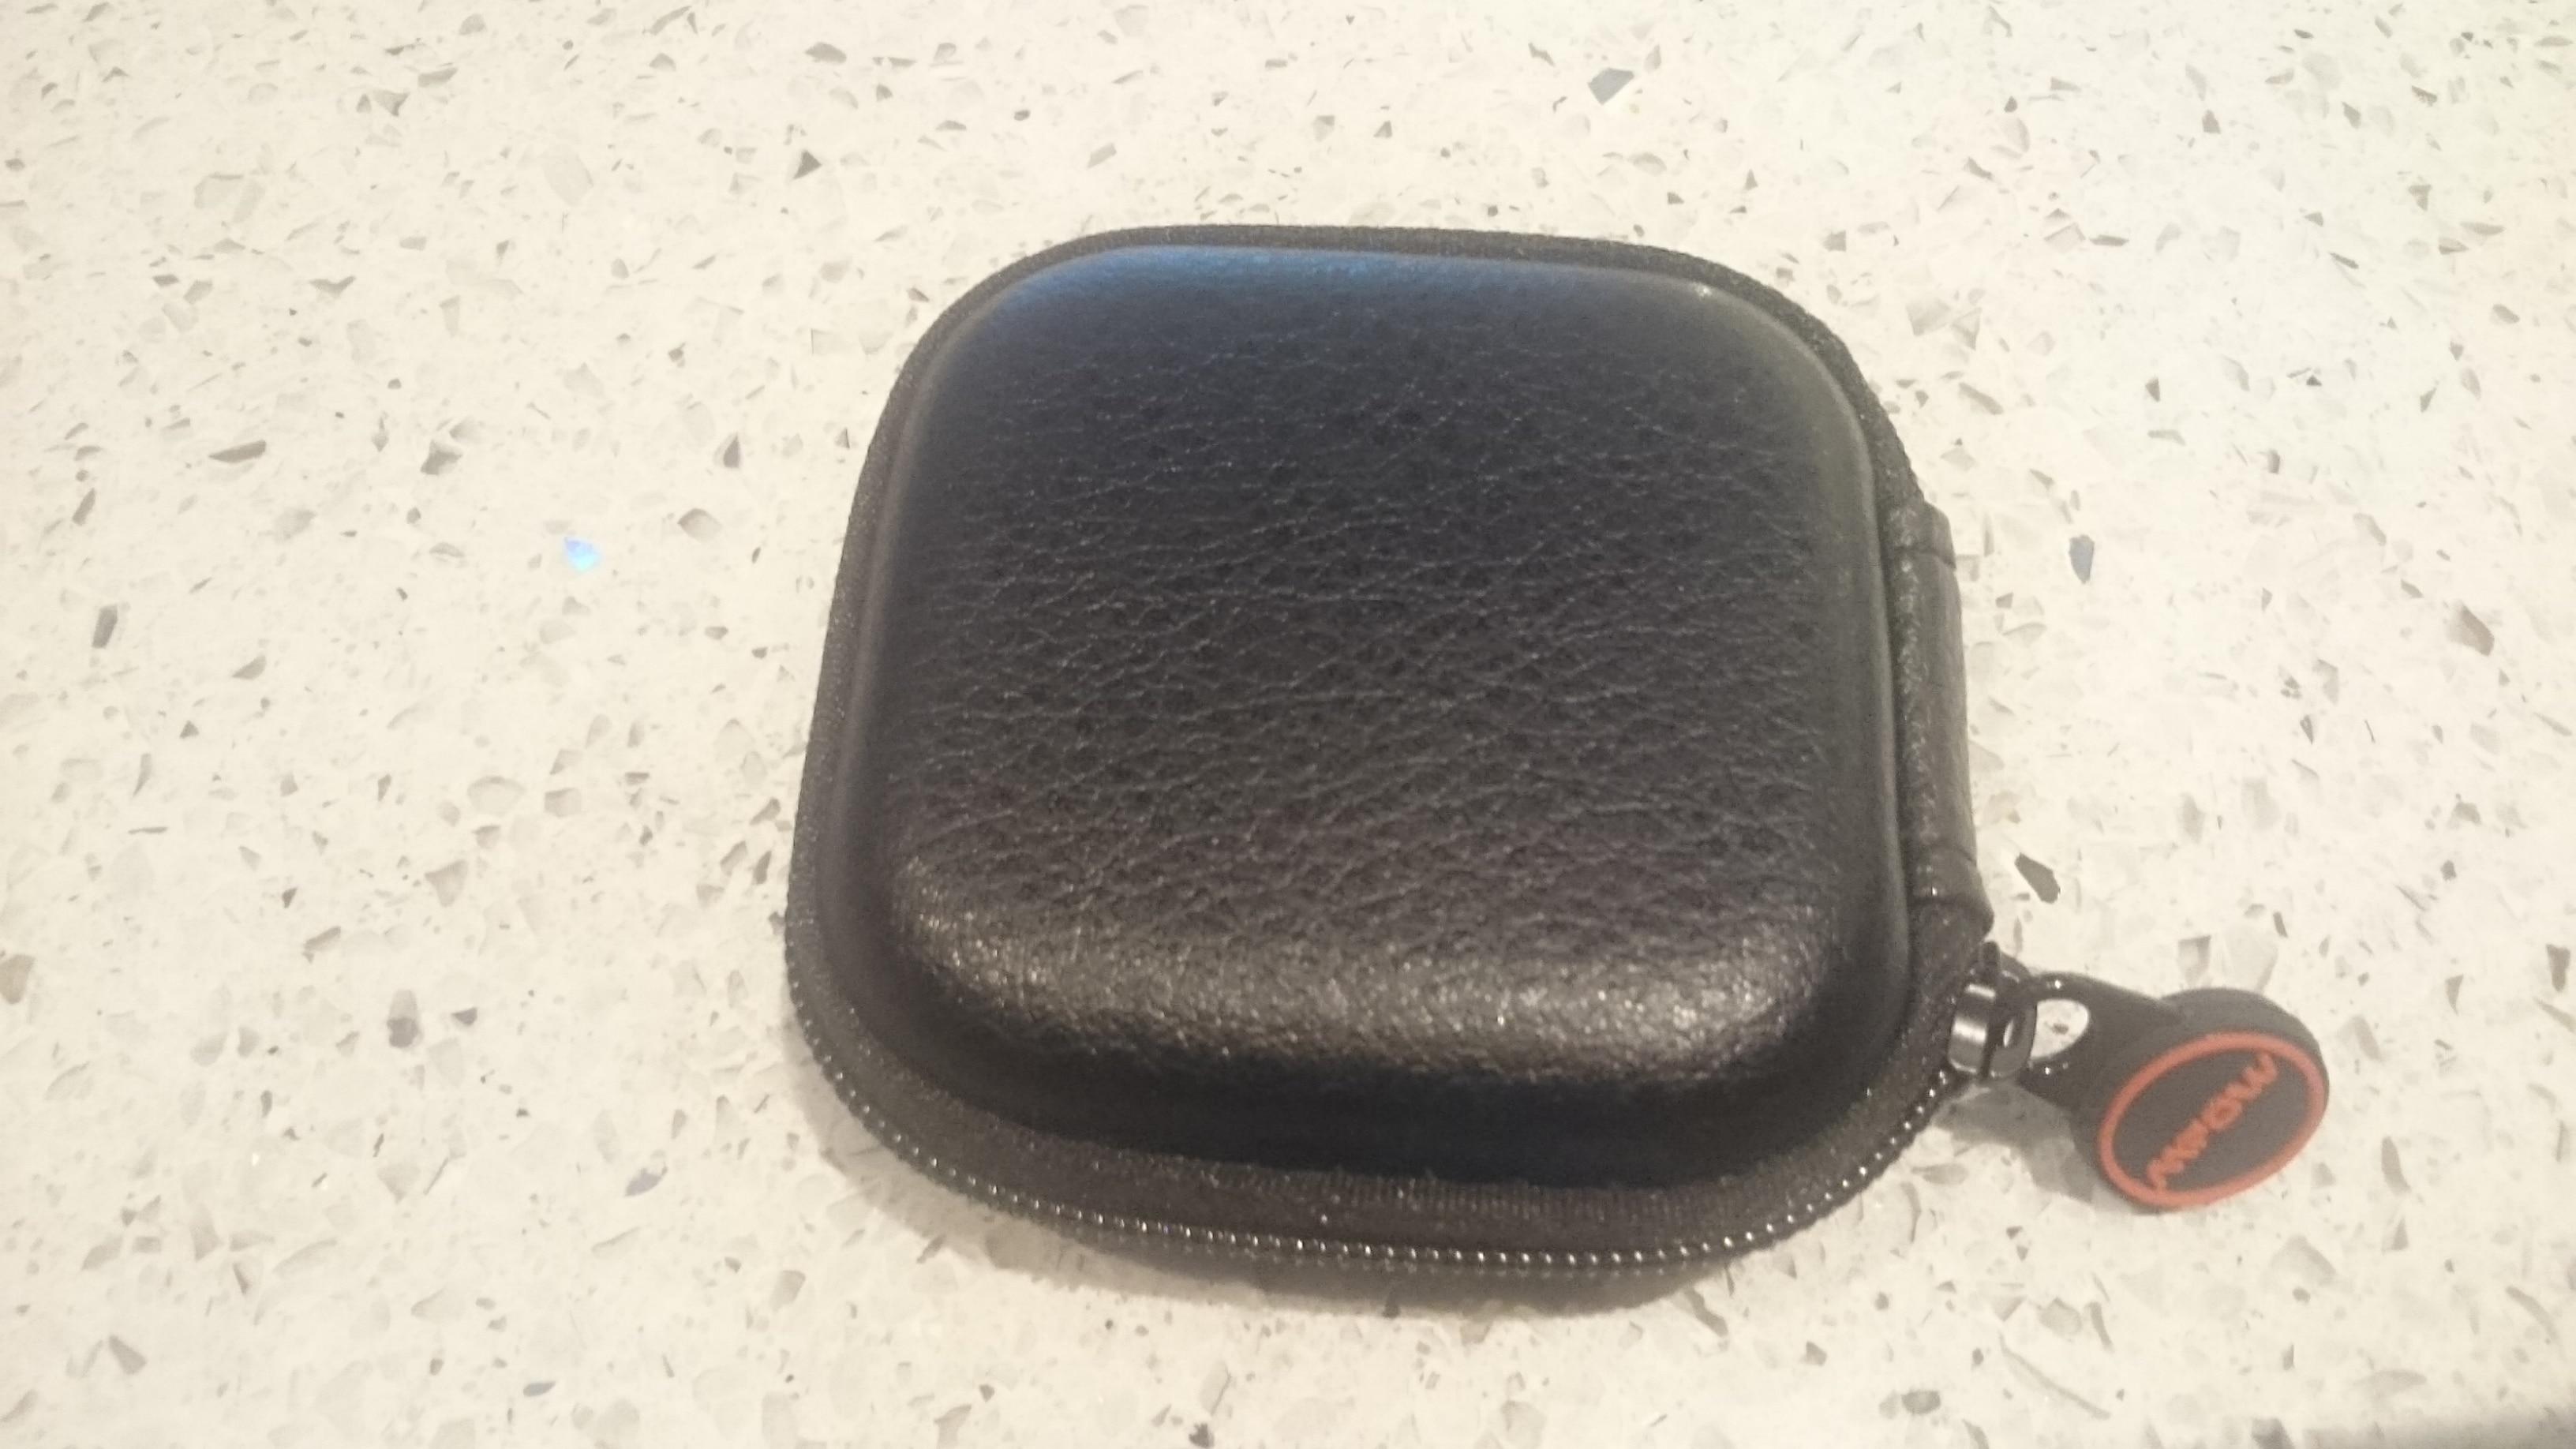 Mpow EM1 Single Bluetooth 4.1 Headphone Wireless Mini Invisible Earpiece In-ear Business Earbud Portable Earphone With Mic/Case